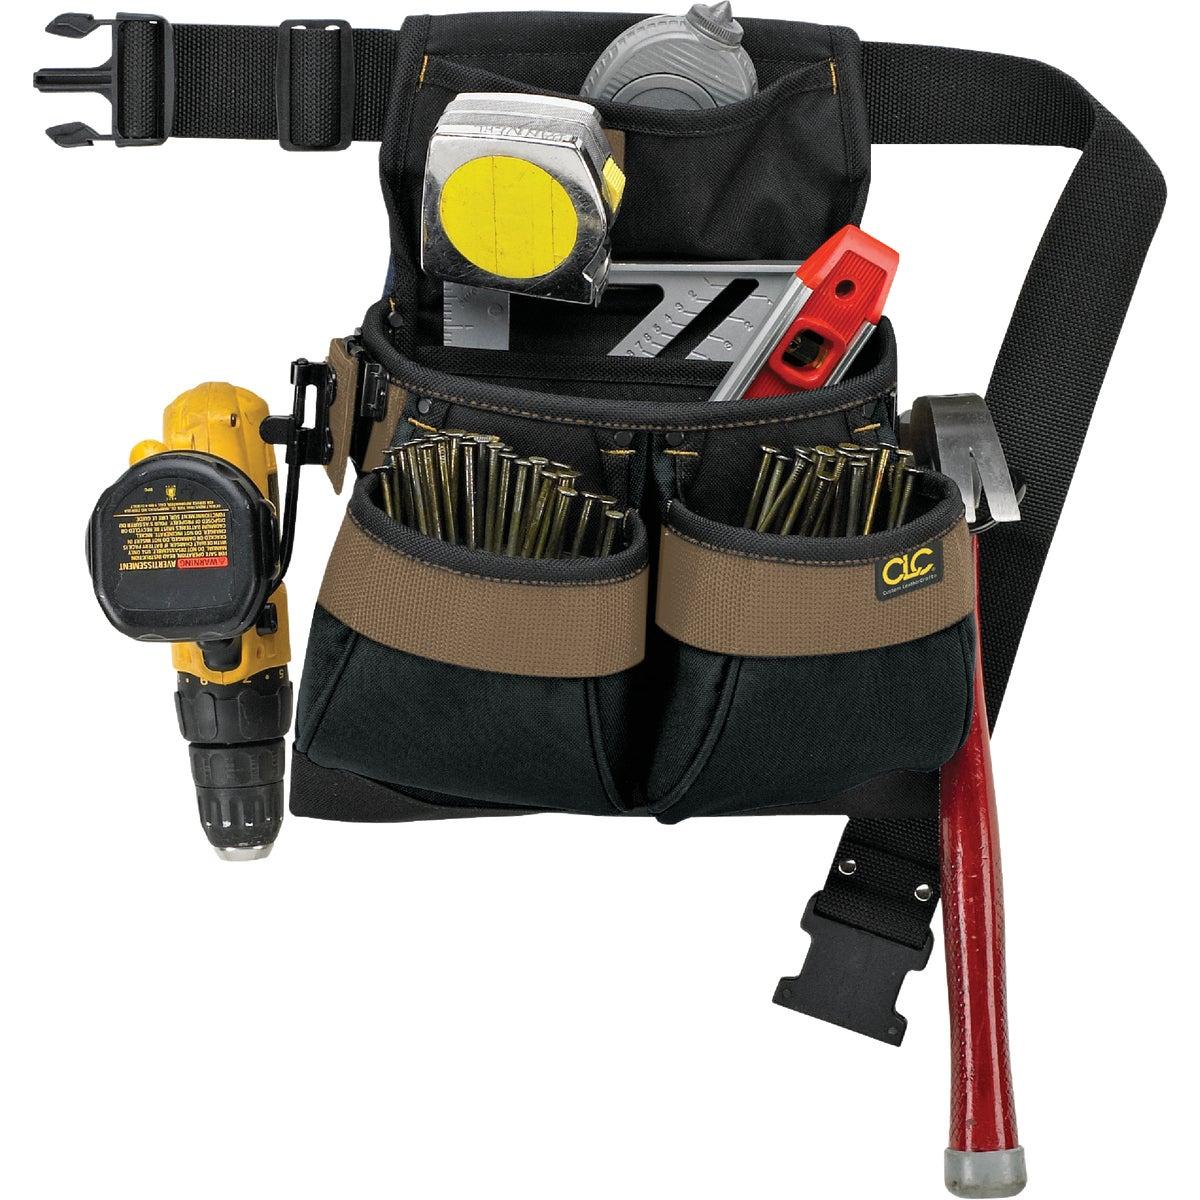 5PKT FRAMER'S BAG - PK1836 by Custom Leathercraft